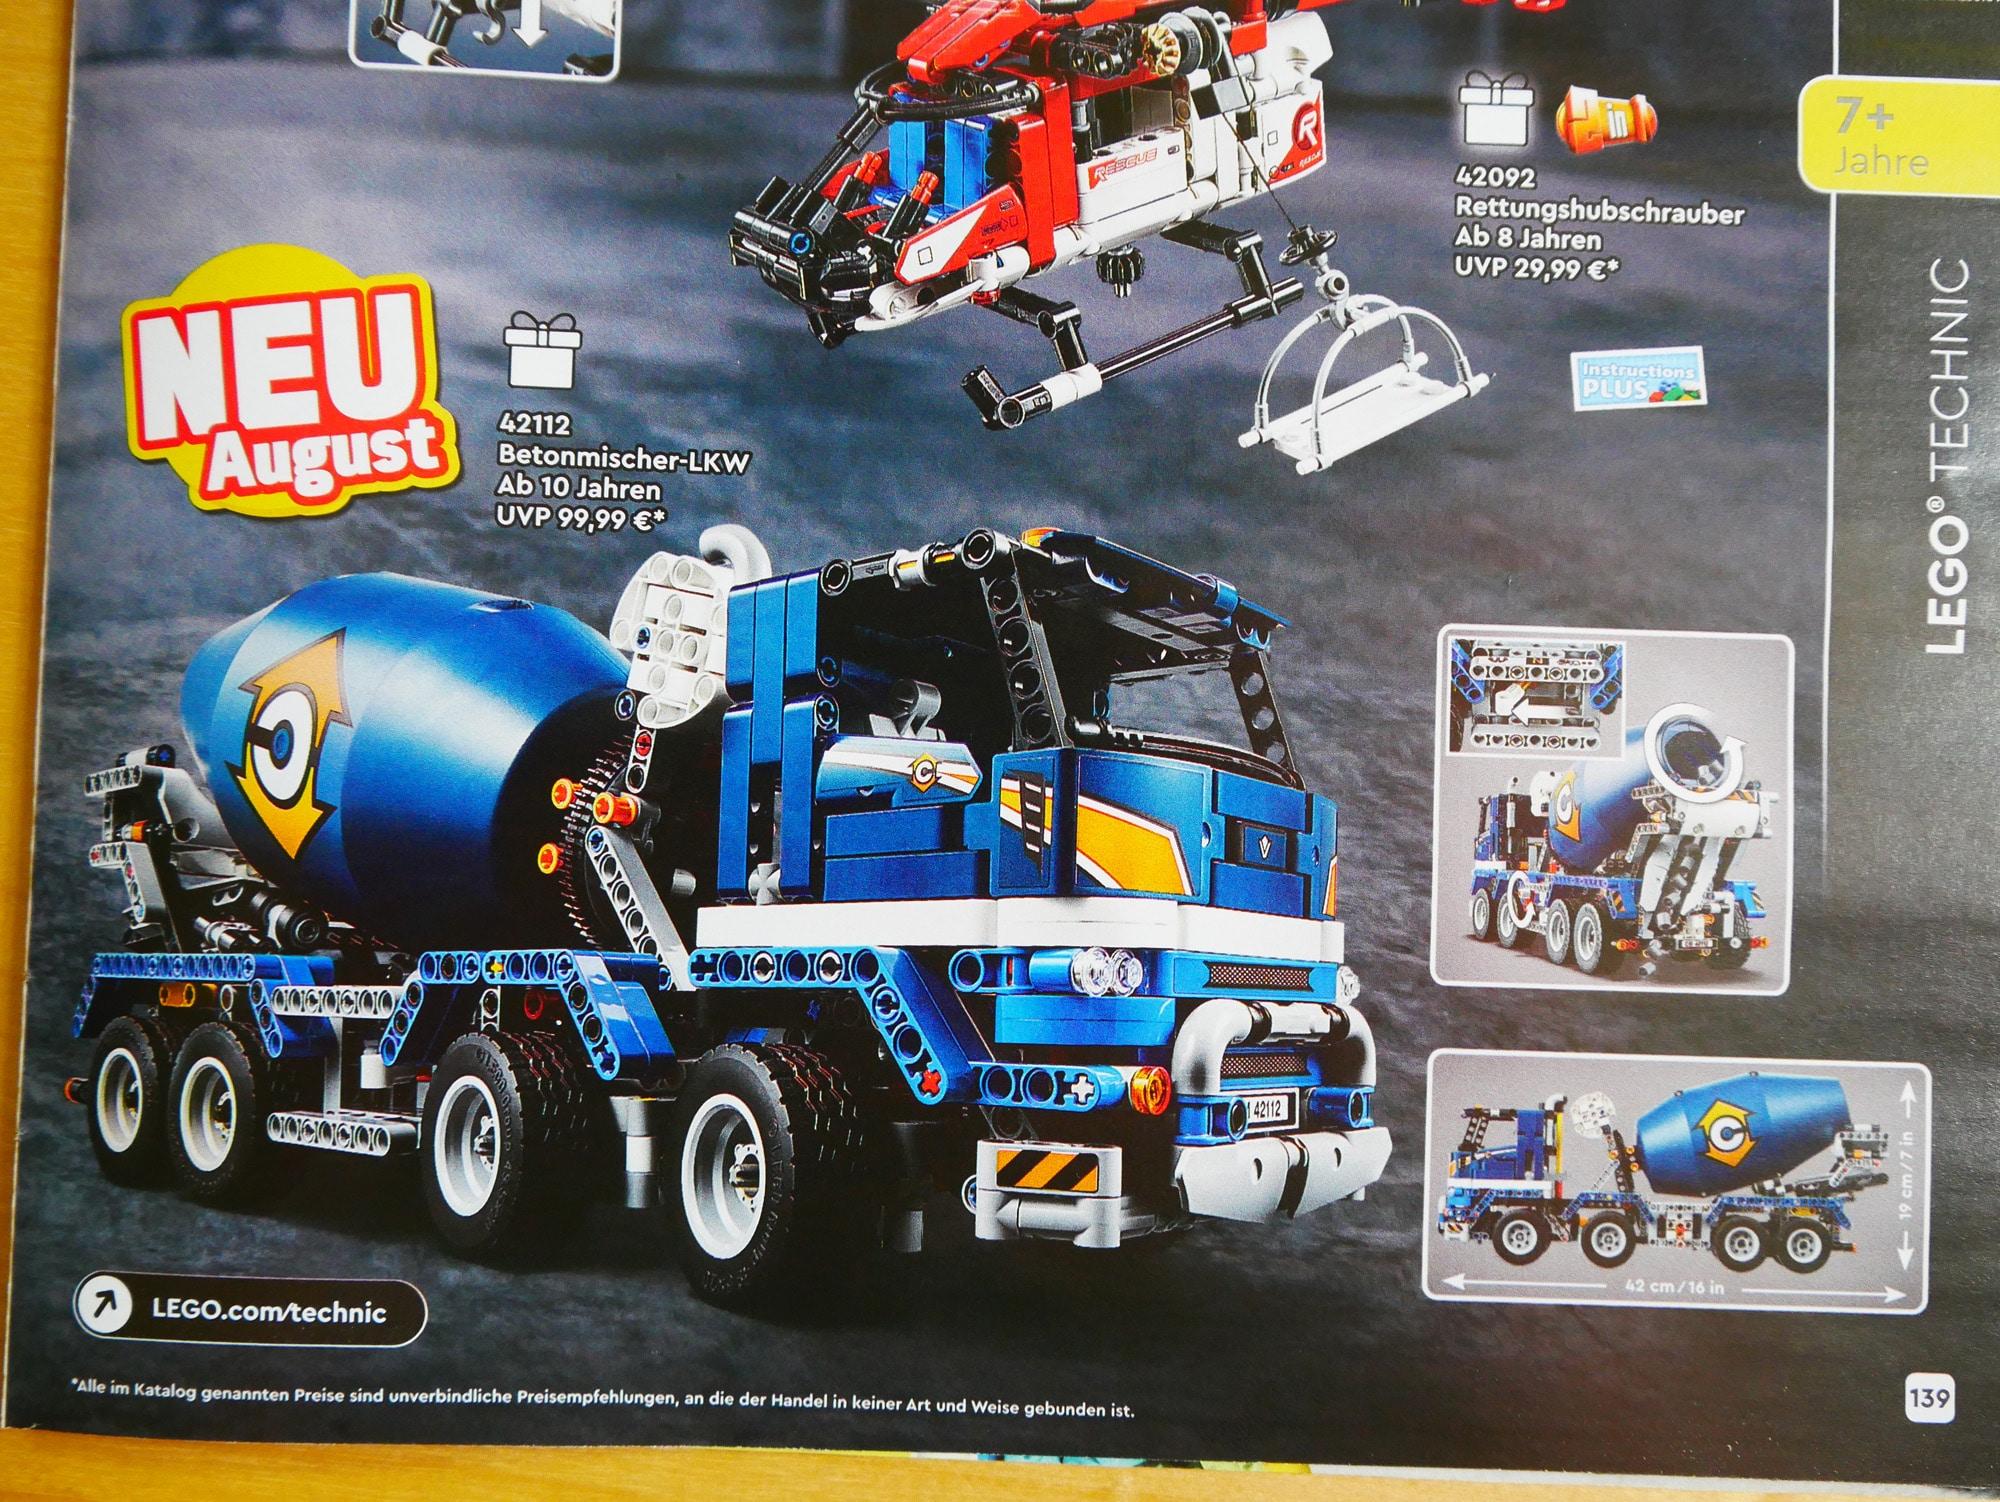 LEGO Technic August 2020 (9)